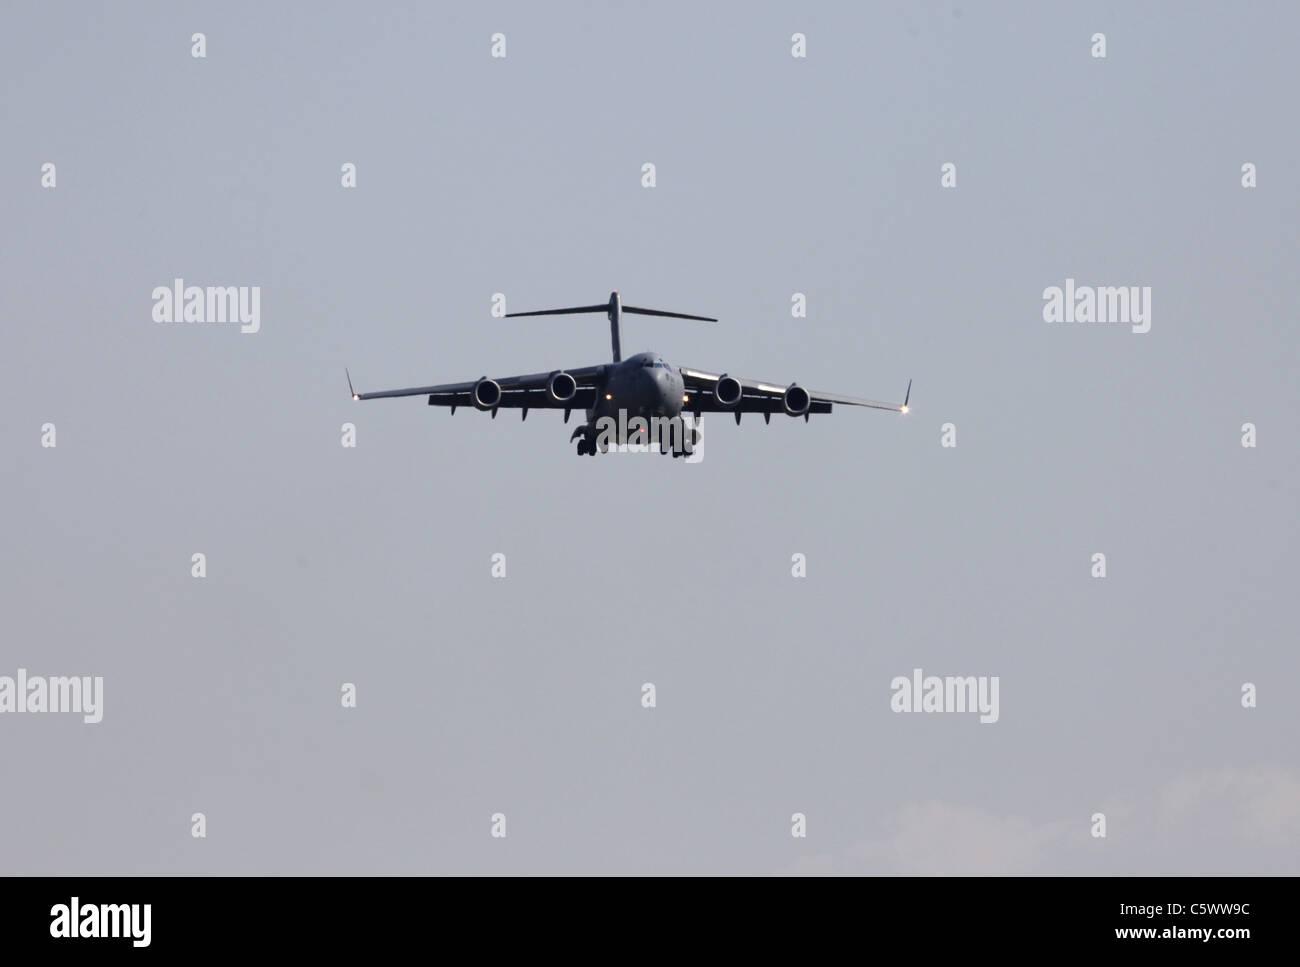 MCDONNELL DOUGLAS C-17 GLOBEMASTER III US AIR FORCE 03 July 2011 - Stock Image